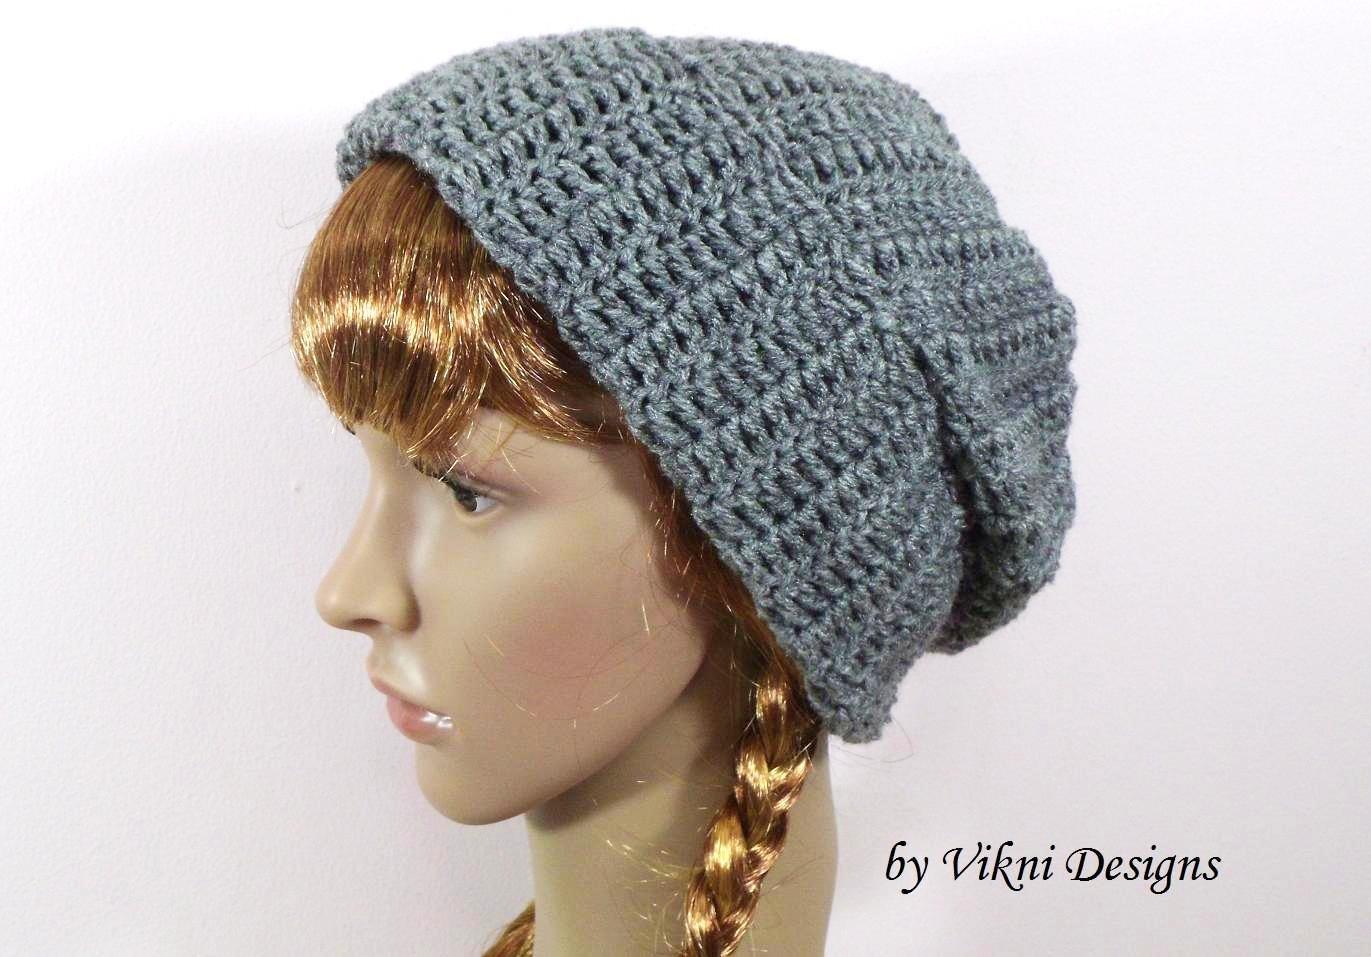 Unisex Crochet Hat Beanie in Gray, Mens Hat, Mens Beanie, Womens Hat Beanie by Vikni Crochet Designs